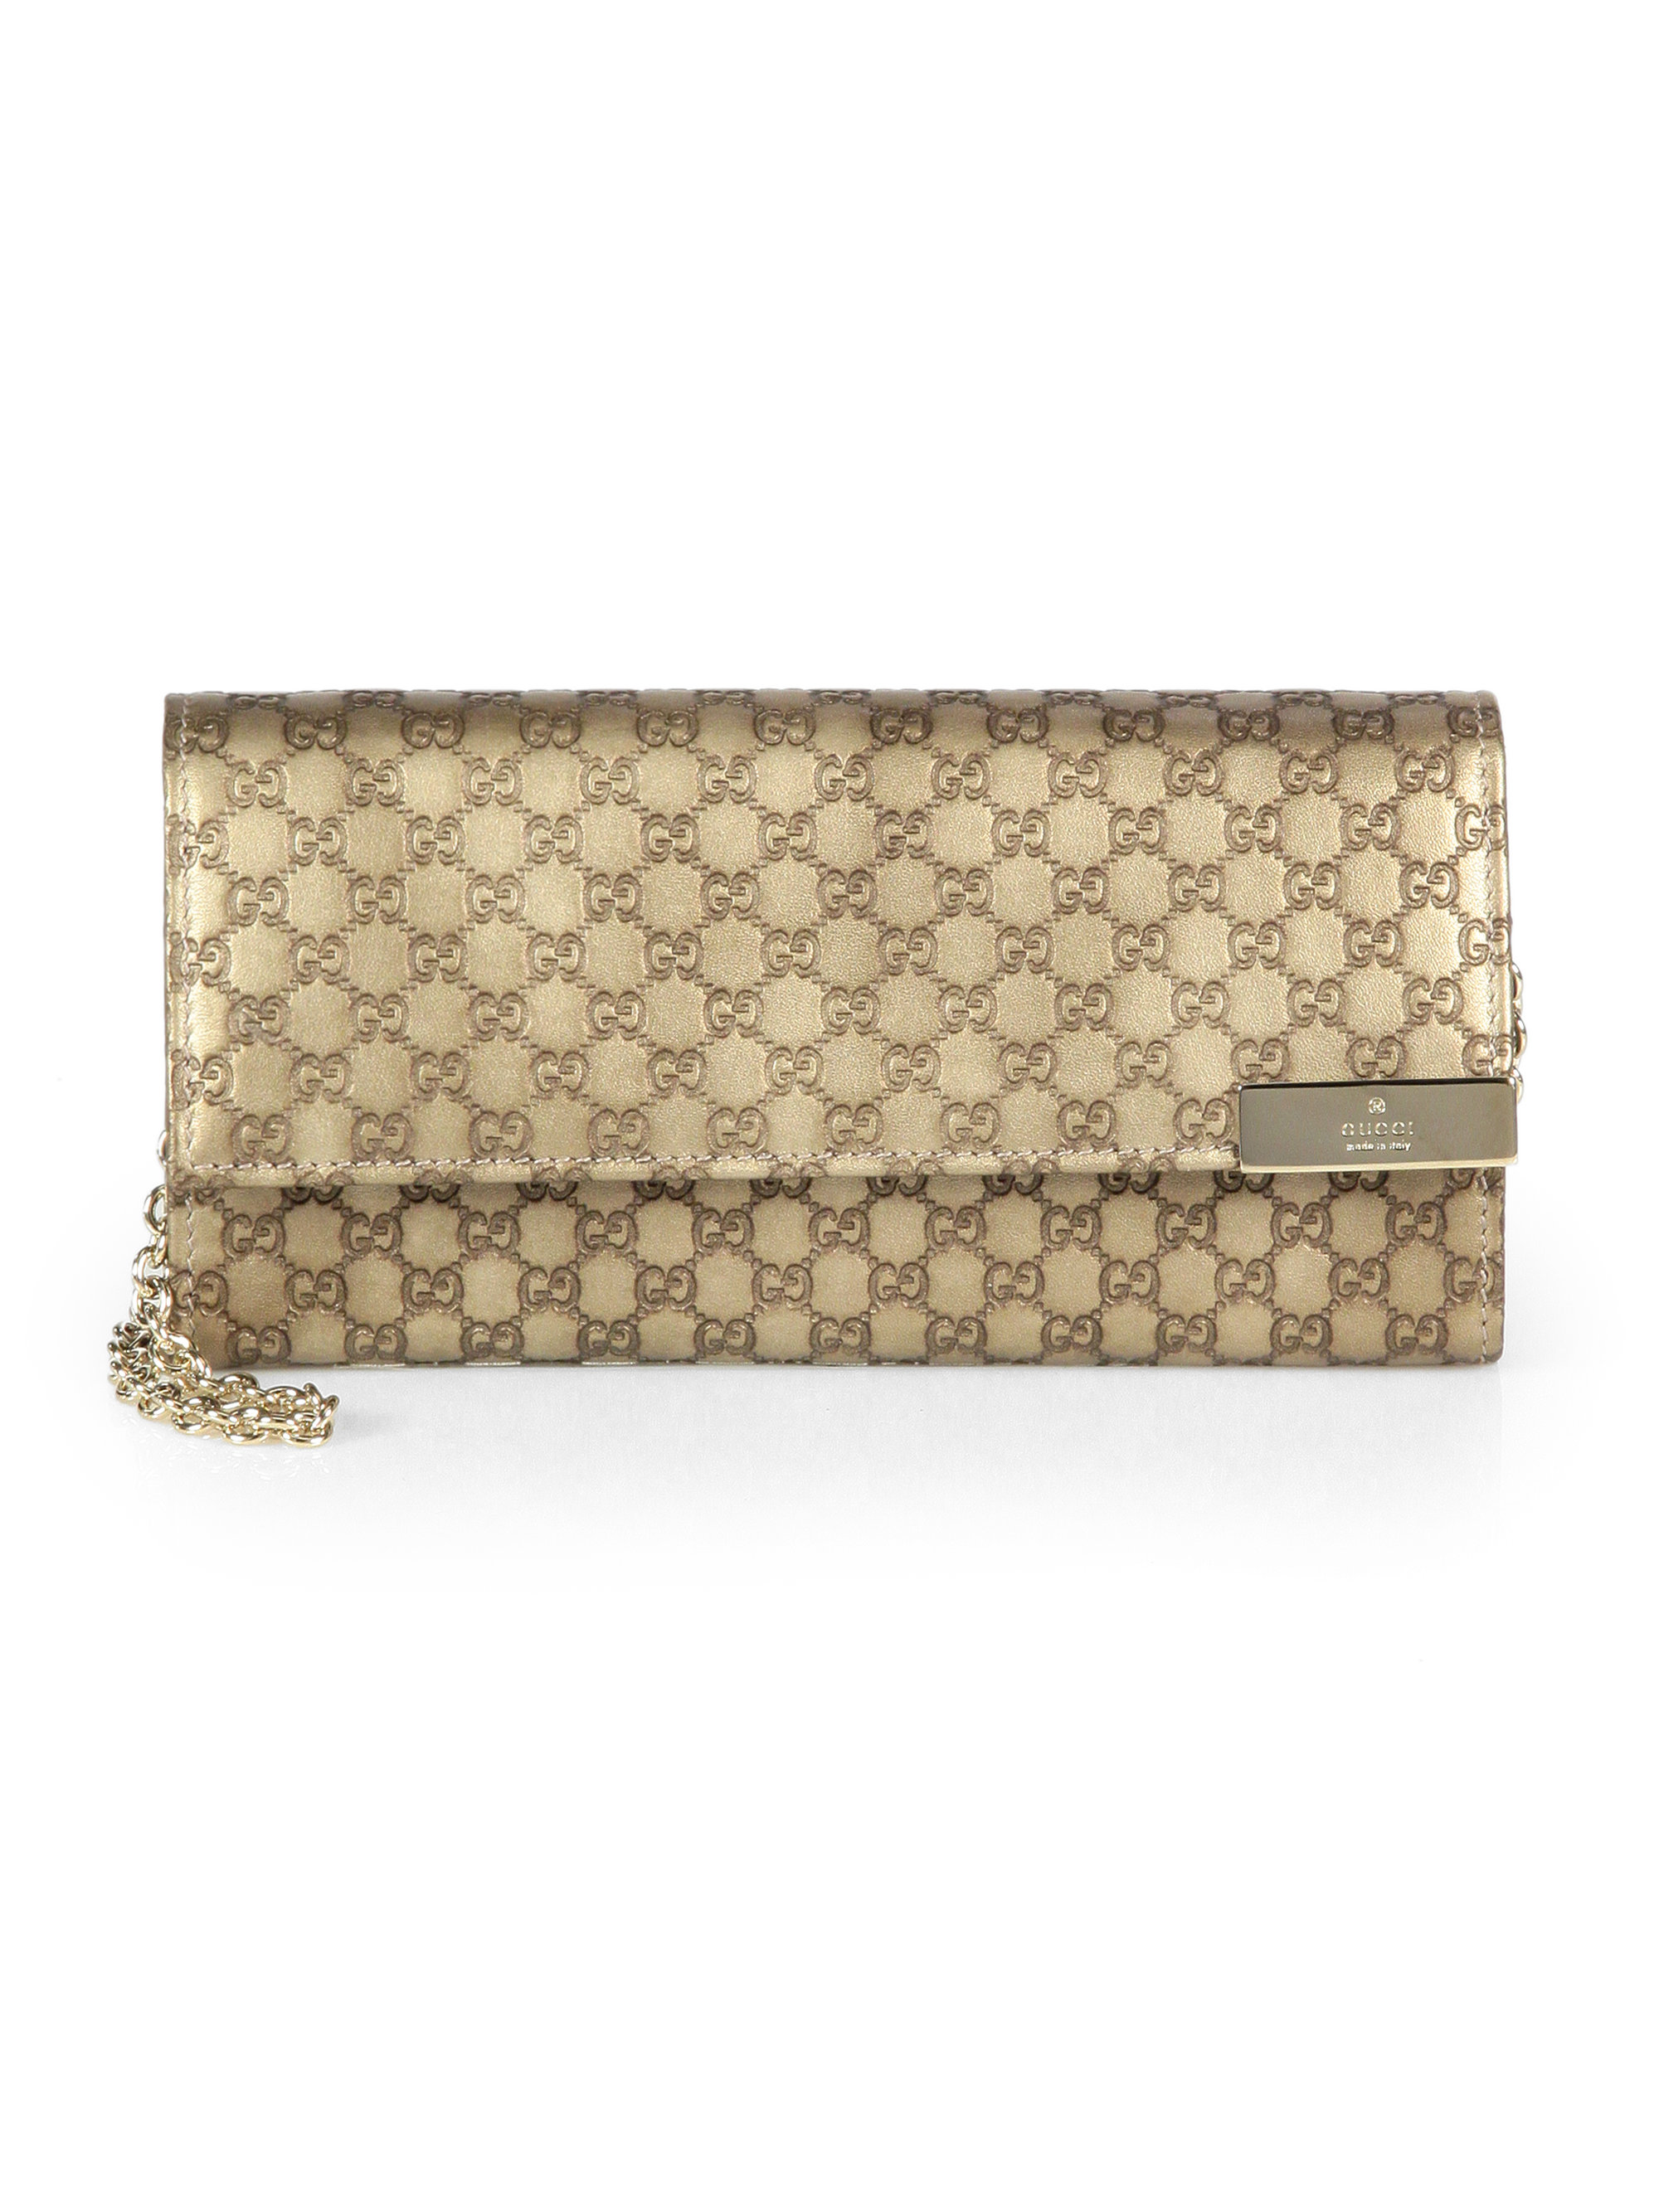 c05ad3d8ef08 Gucci Dice Metallic Microguccissima Leather Chain Wallet in Metallic ...